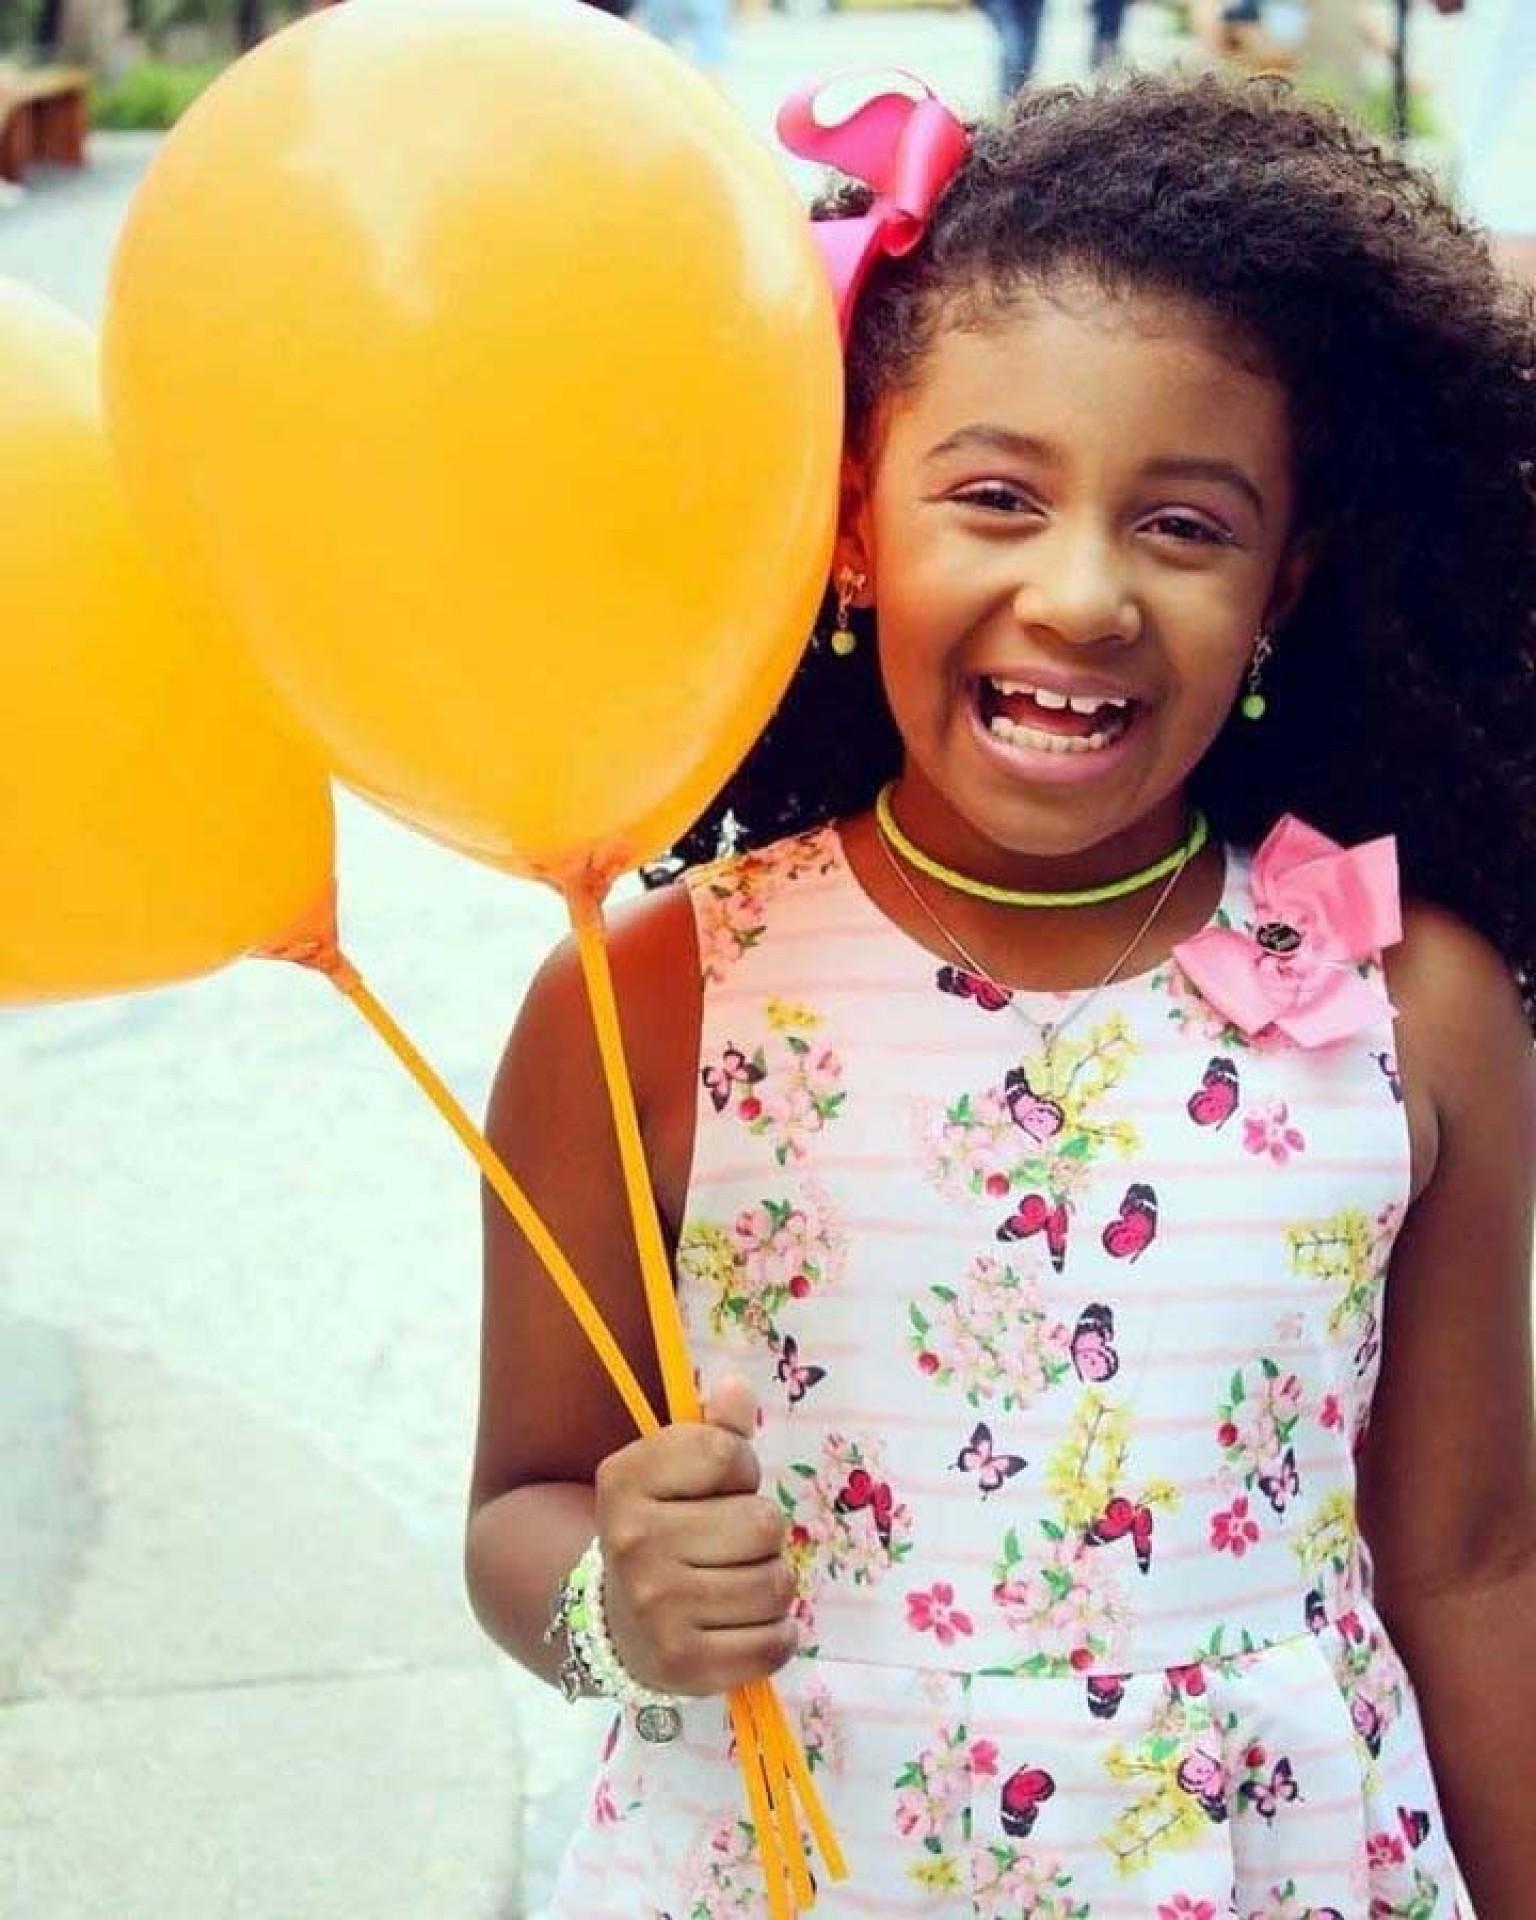 Foto de Agatha Felix, menina negra, sorrindo, segurando balões amarelos.